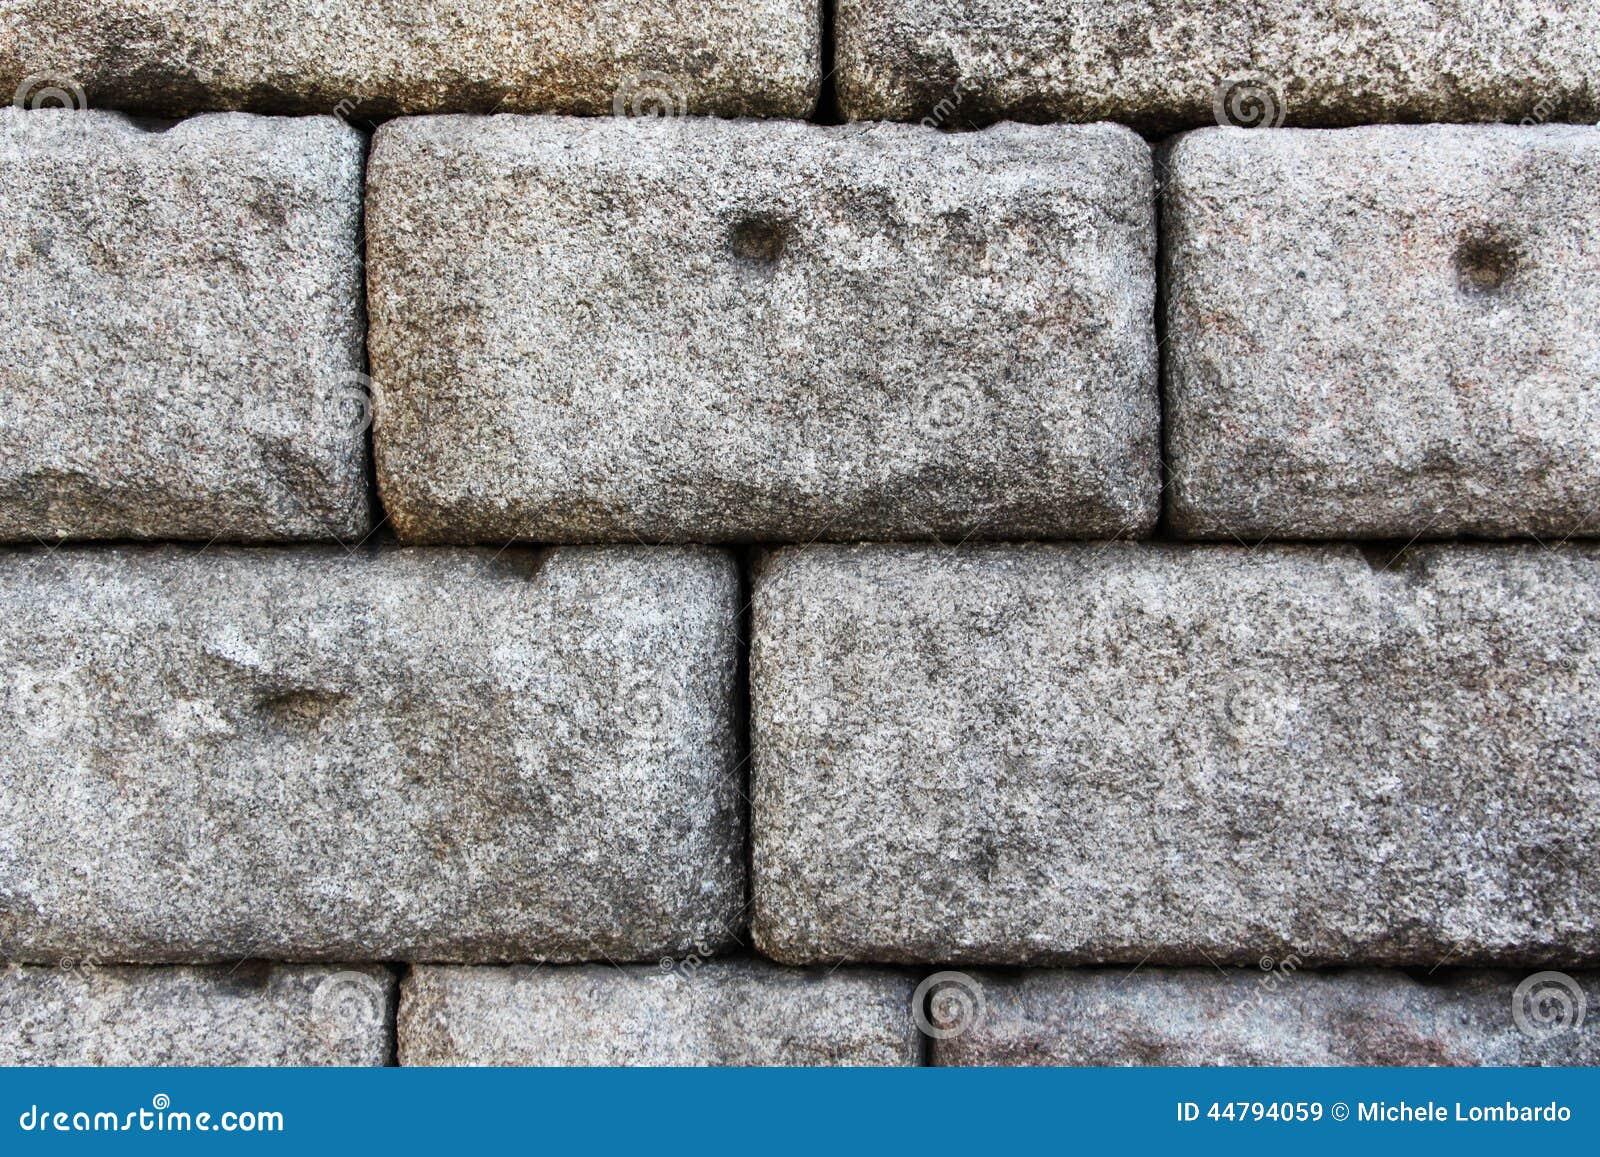 Large Stone Blocks : Big stone blocks stock image of pillars detail